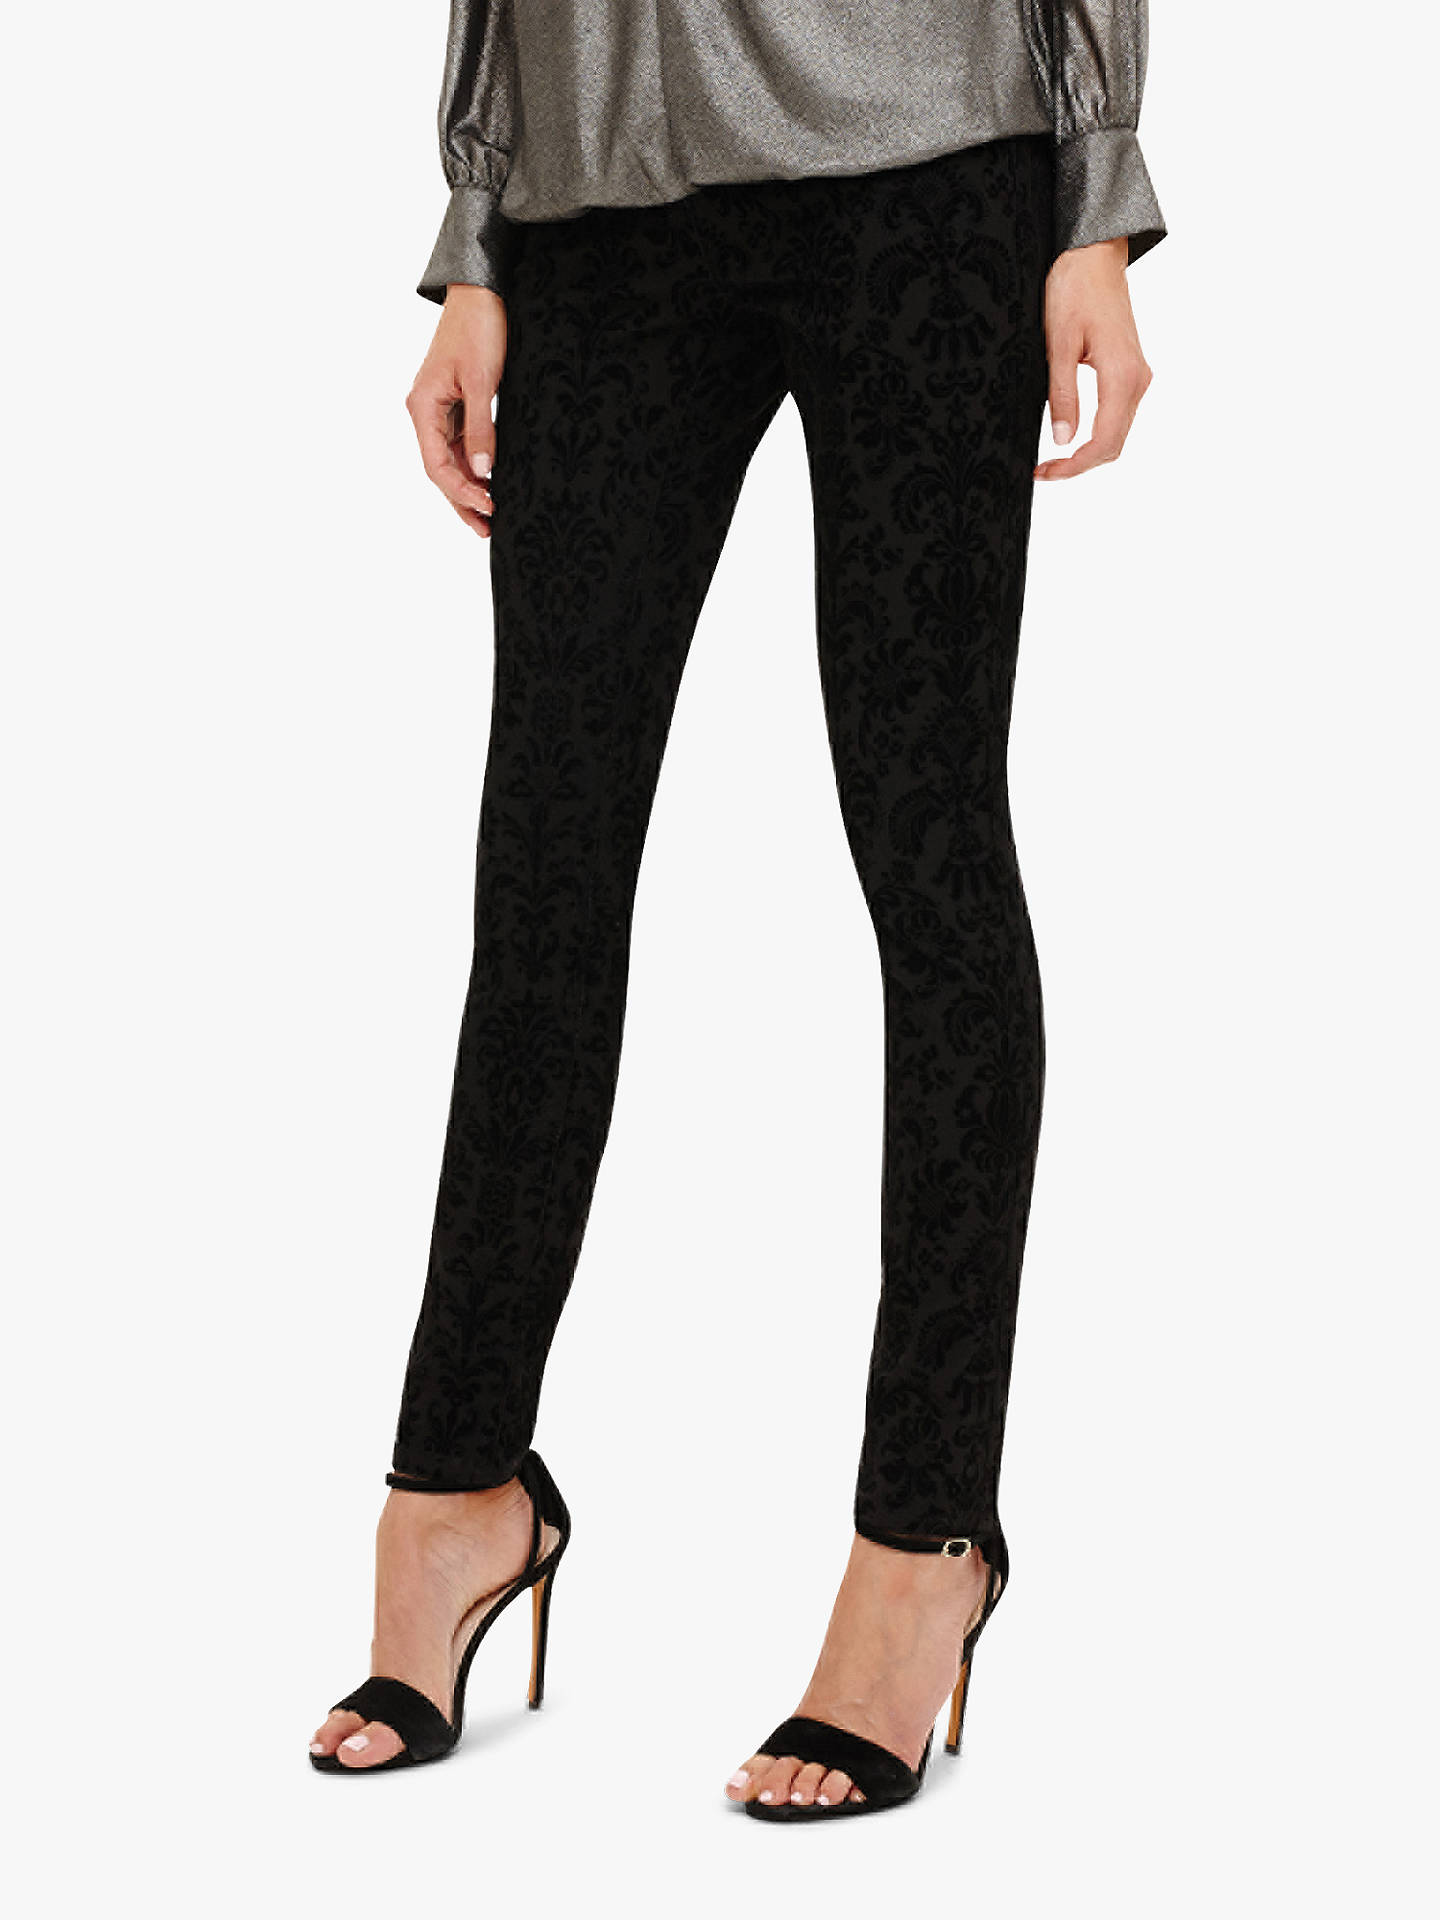 cbb425499e Buy Phase Eight Flocked Floral Skinny Jeans, Black, 12 Online at  johnlewis.com ...